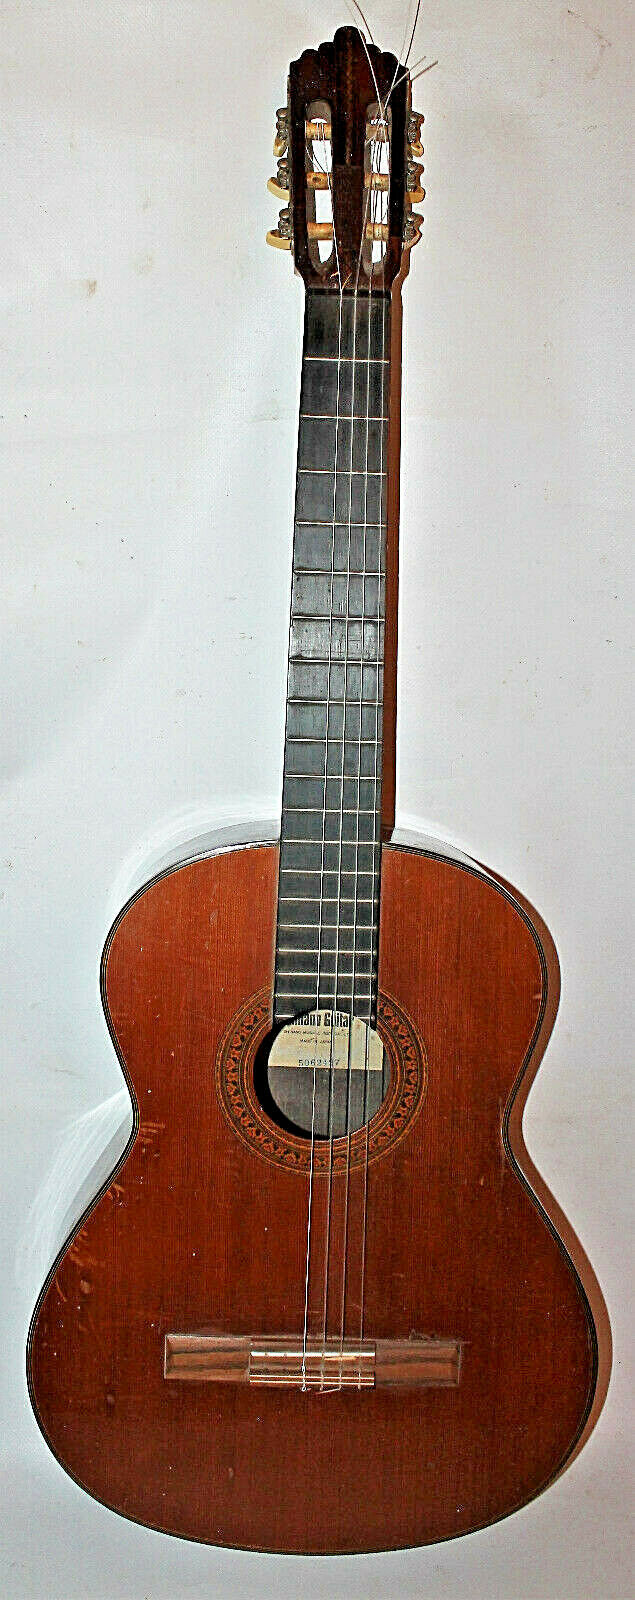 Ancienne guitare classique Shinano Guitar model 53 numéro 5062427